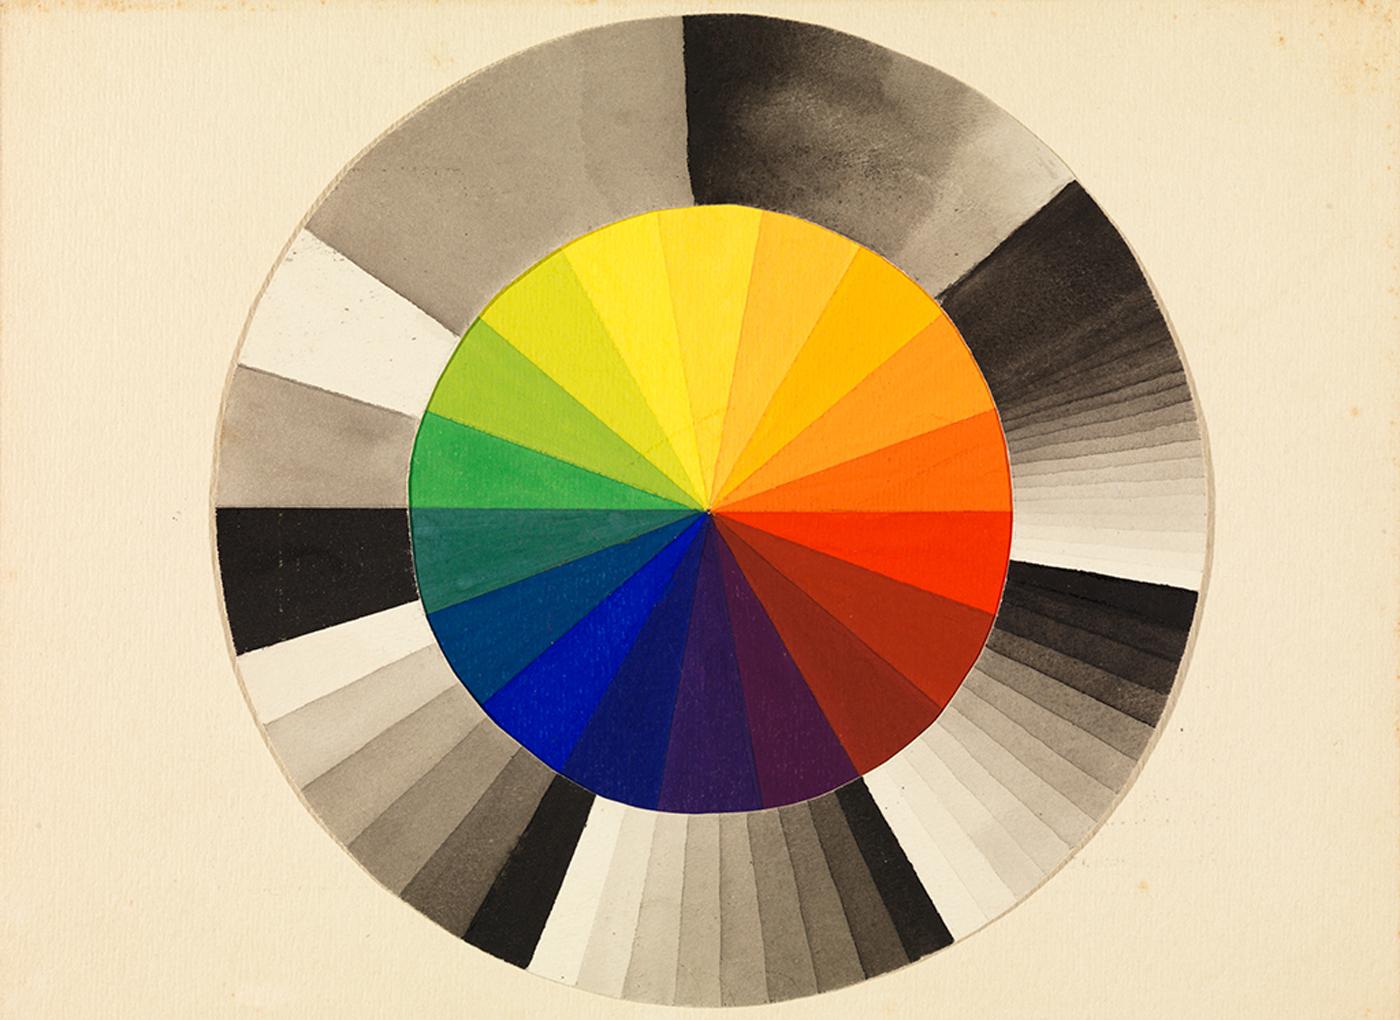 Bauhaus Beginnings, art exhibit @ The Getty Center // photo source: getty.edu